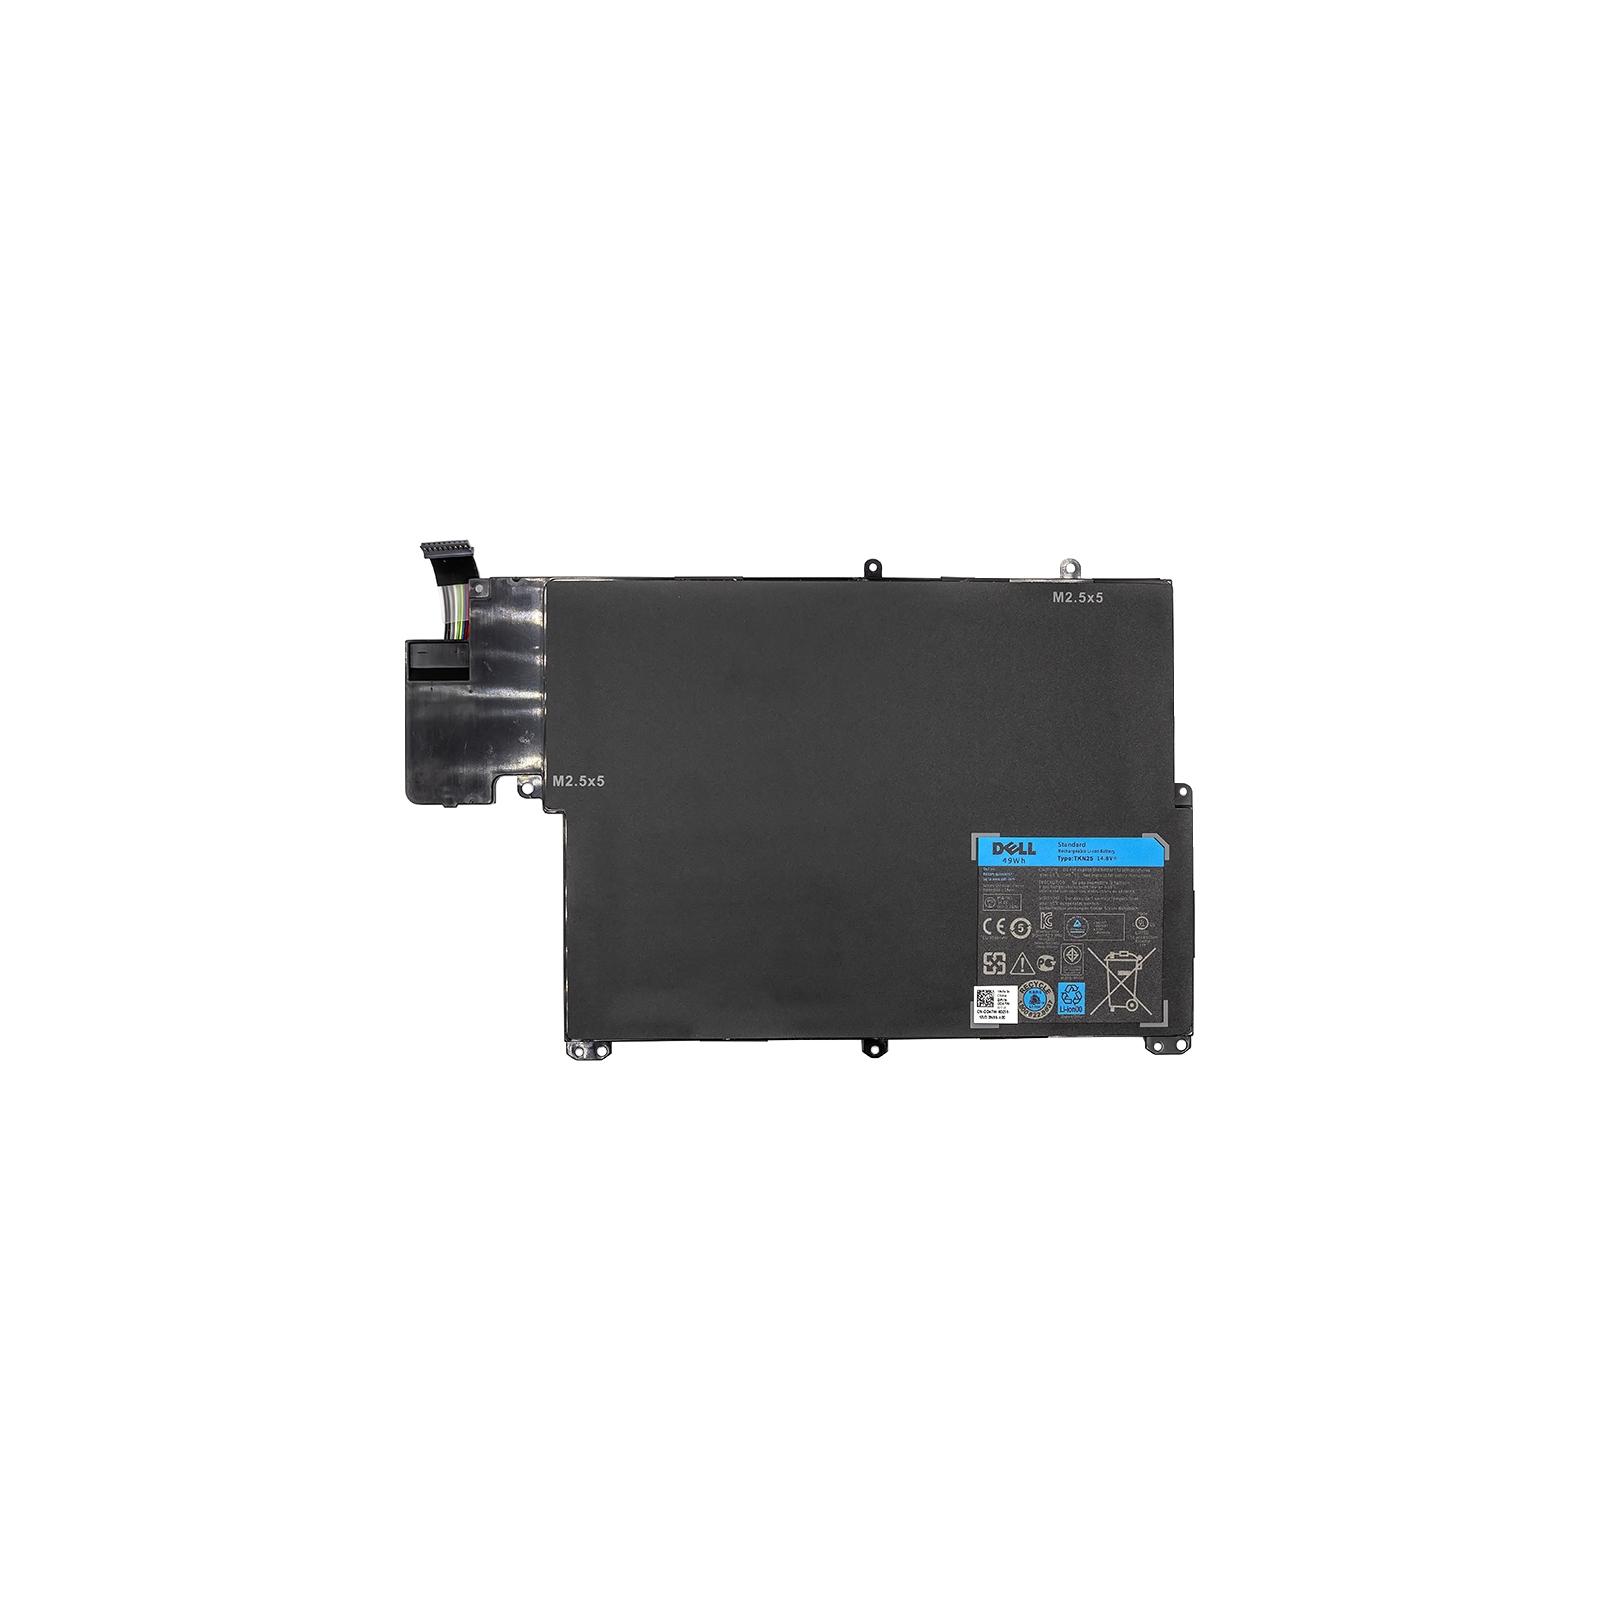 Аккумулятор для ноутбука Dell Inspiron 13z-5323 (TKN25) 14.8V 49Wh (NB440955) изображение 2